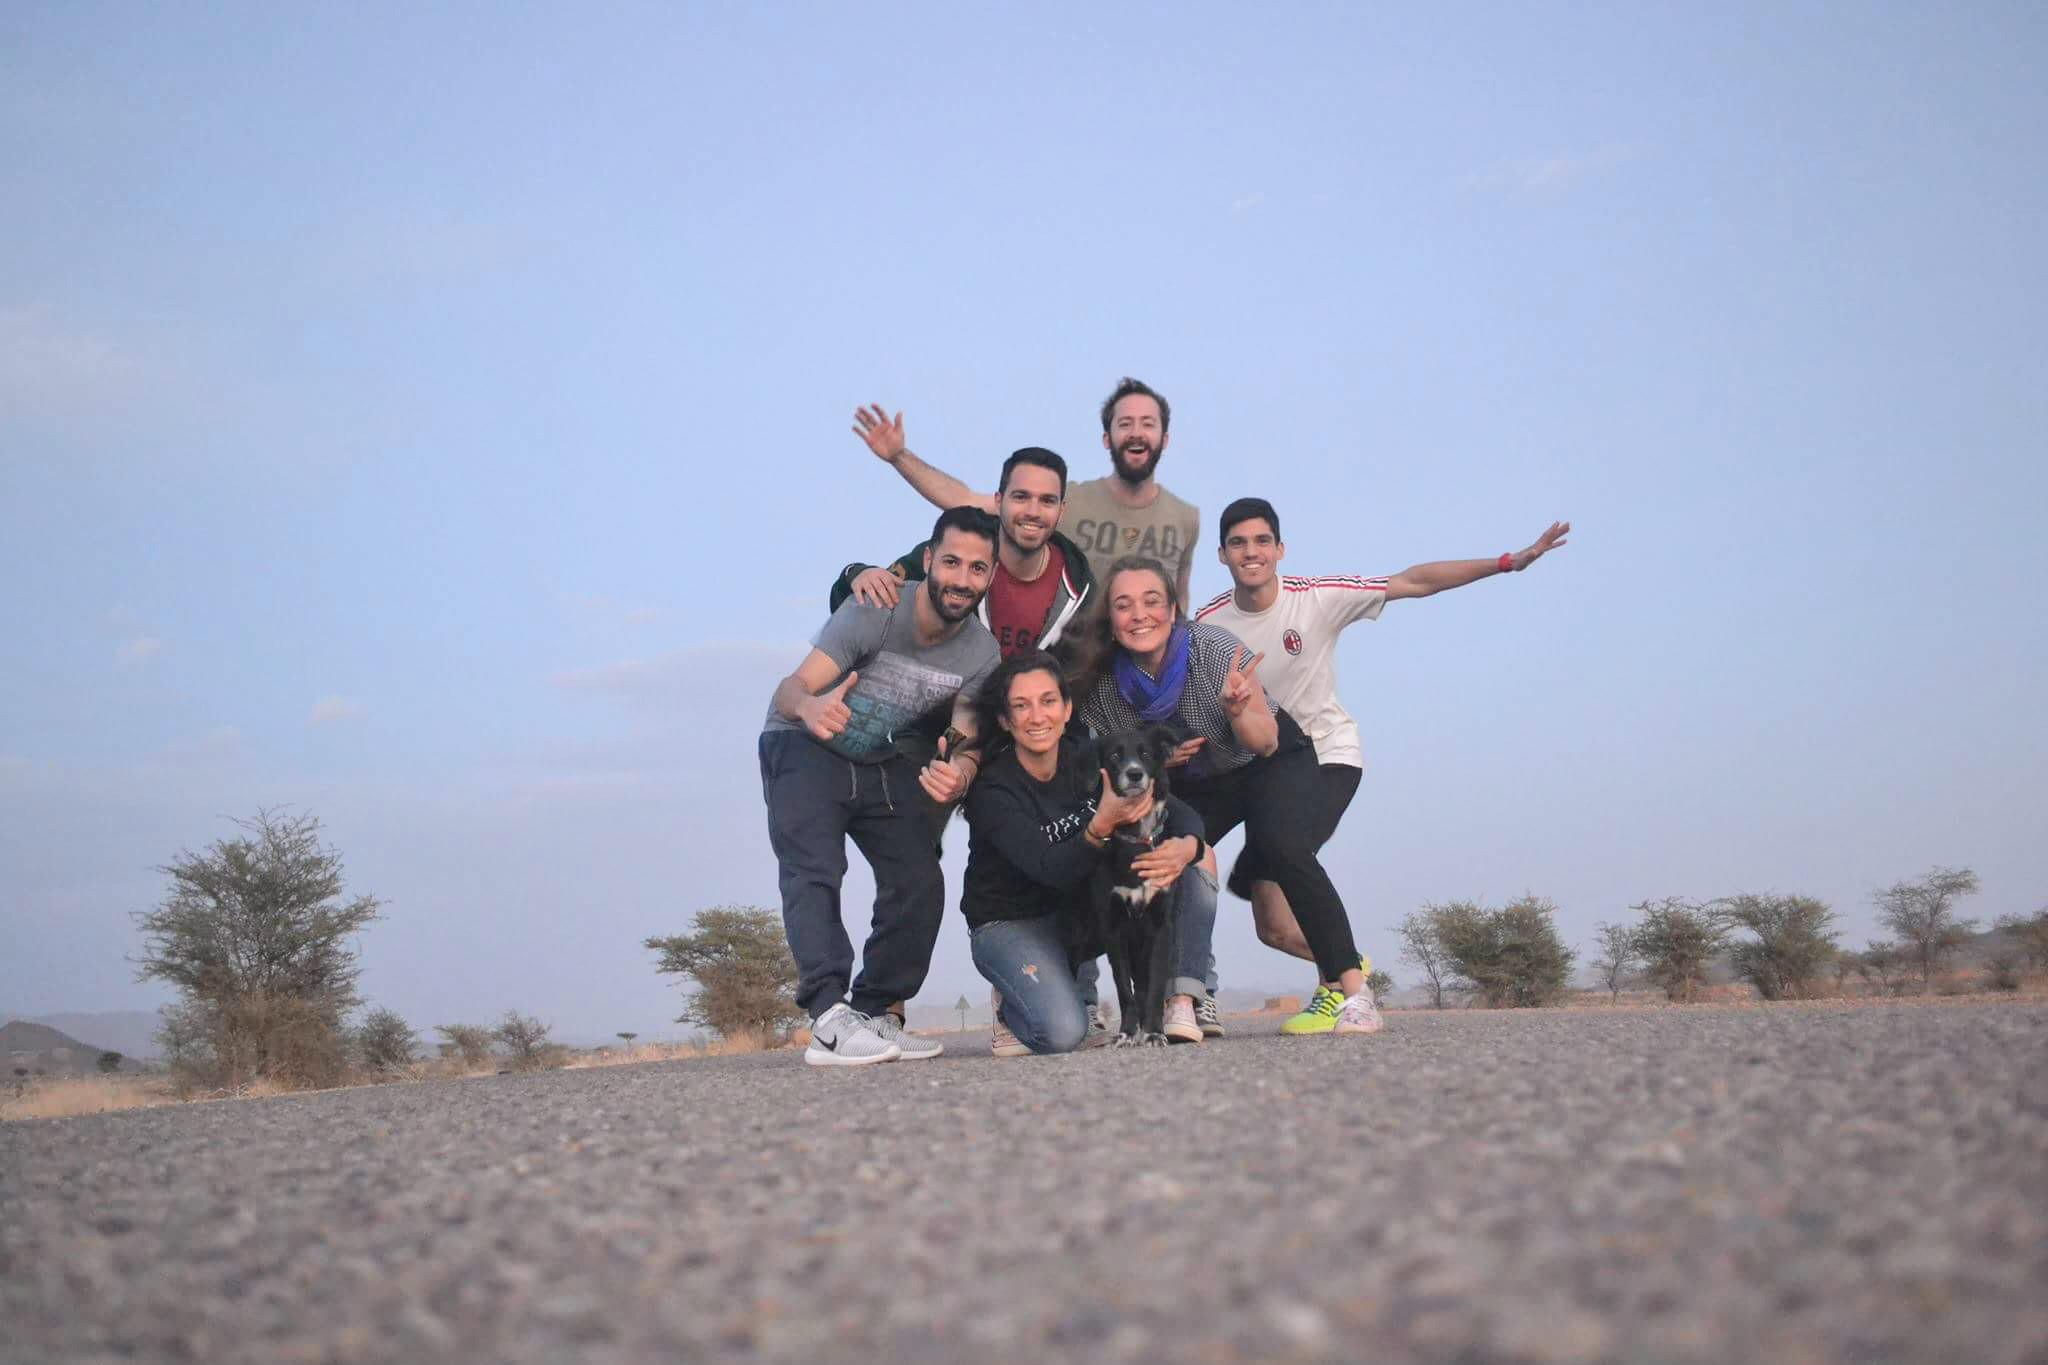 babel road trip blog camille in bordeaux